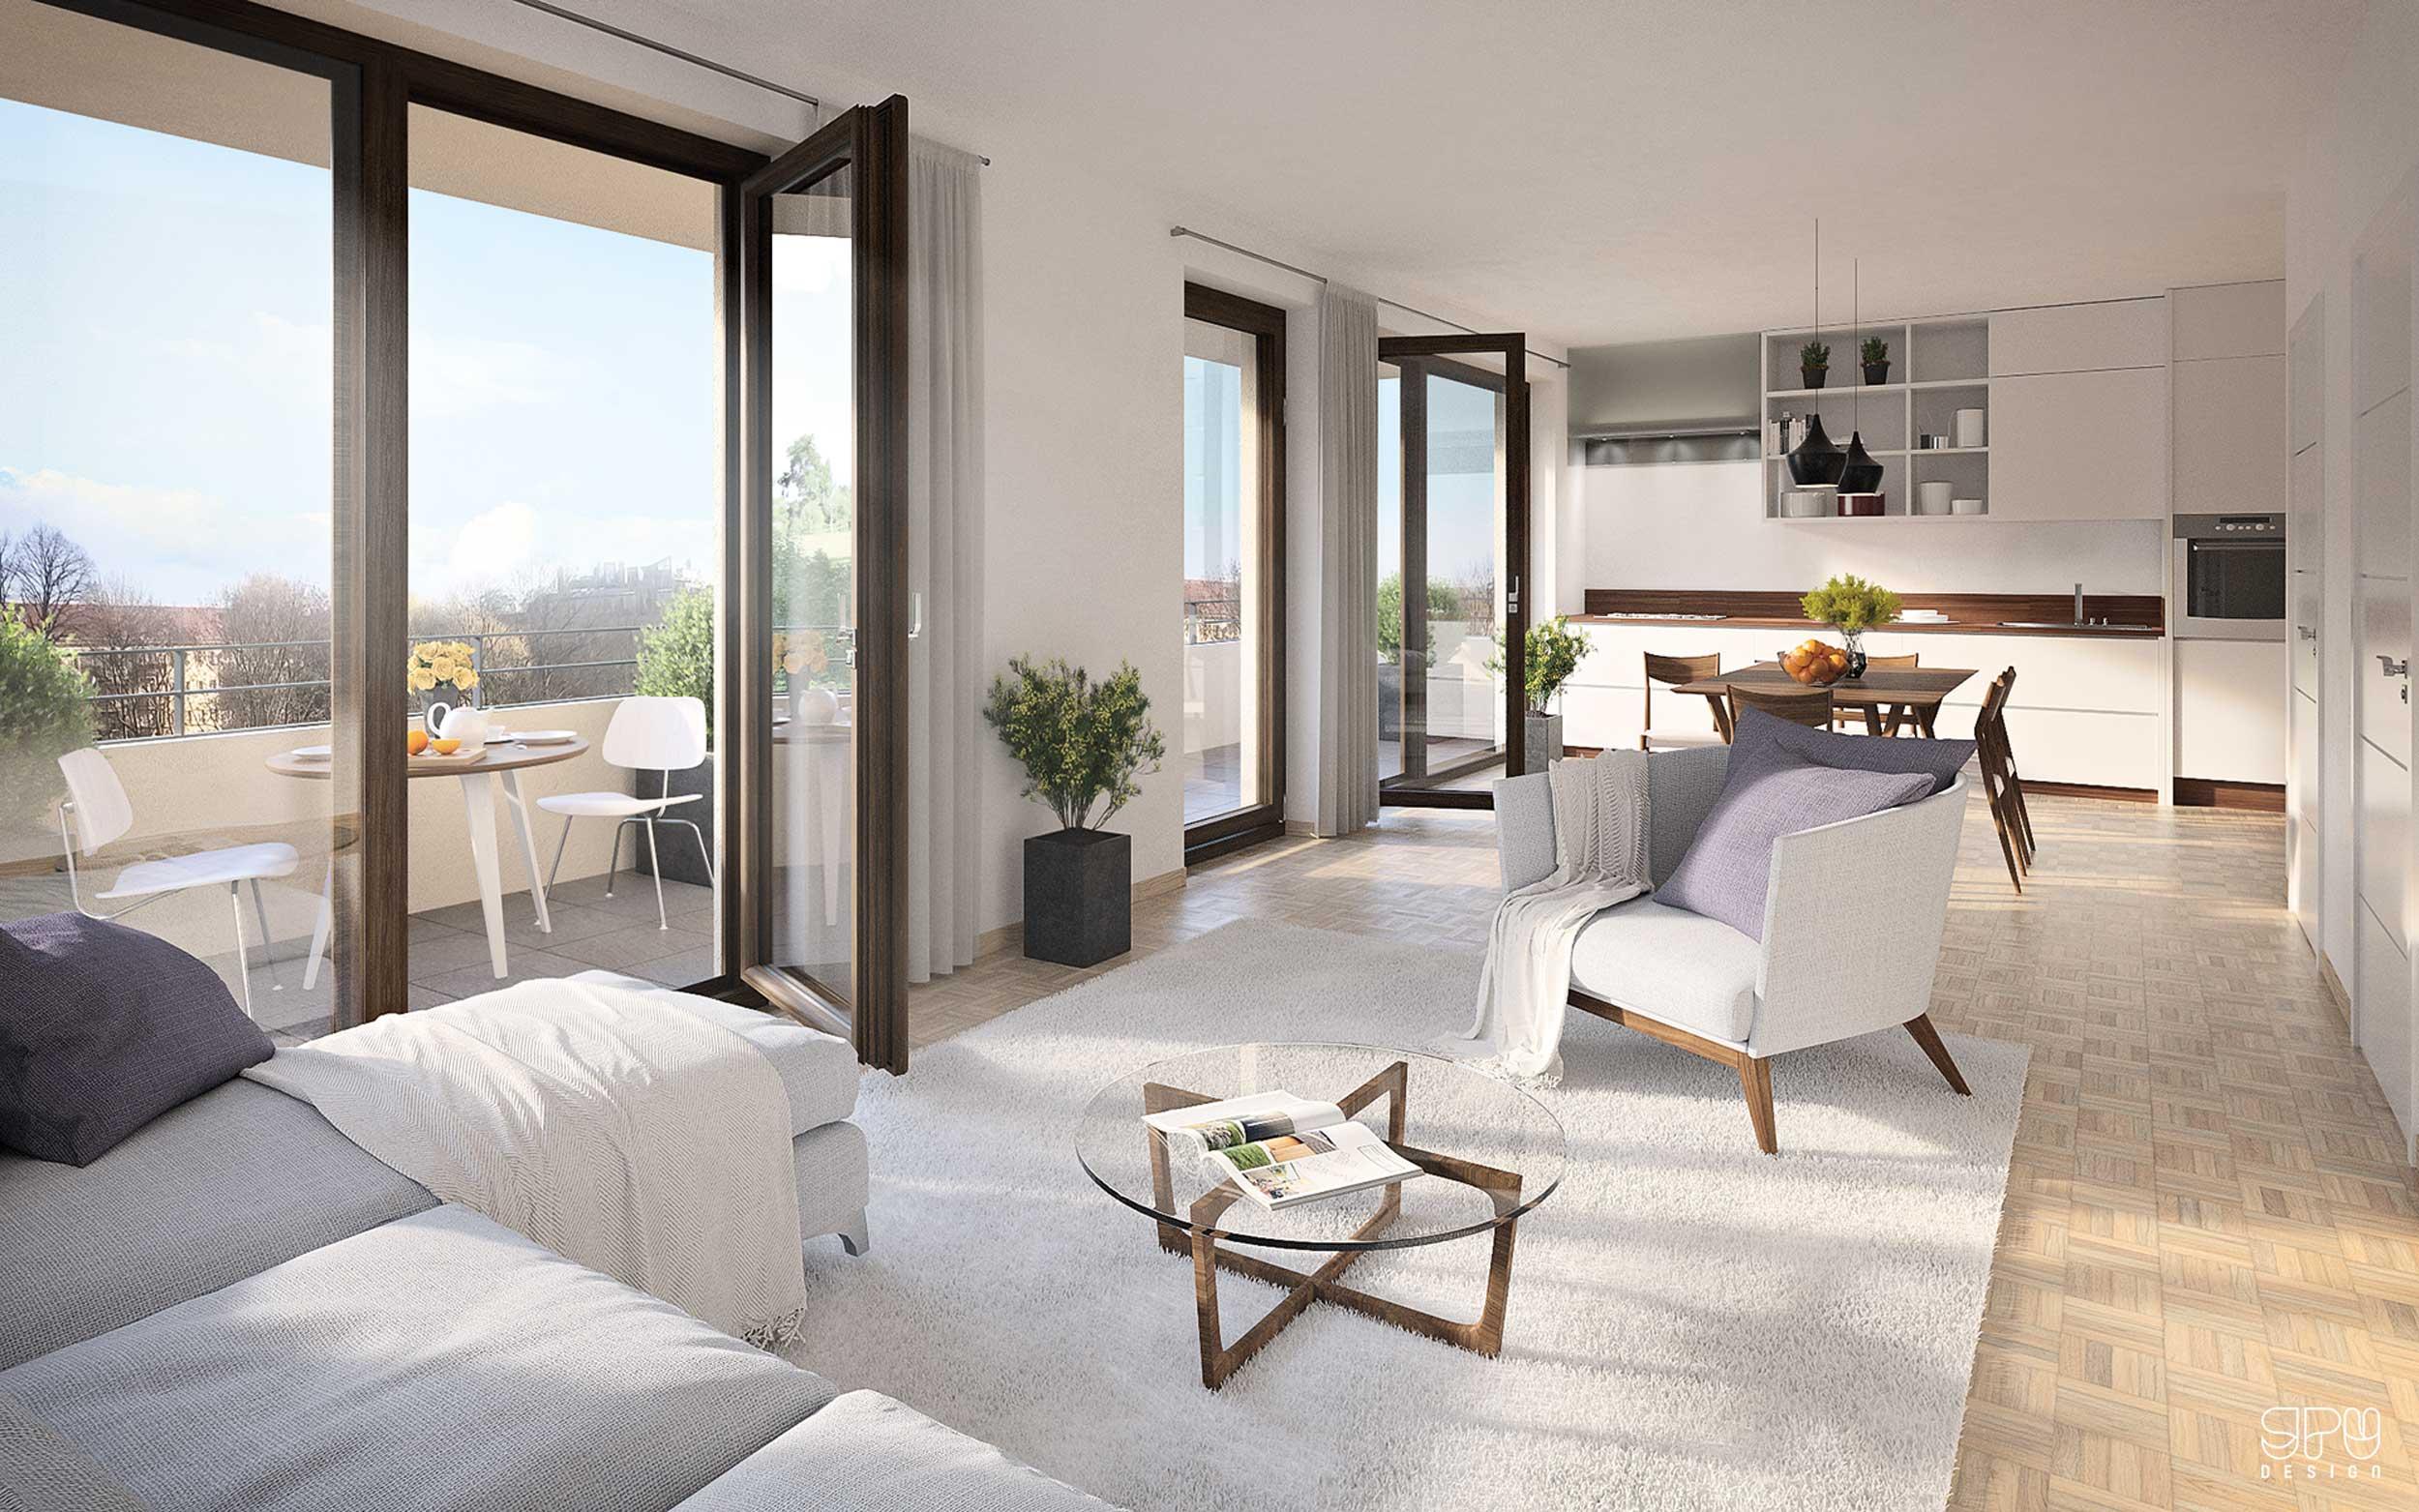 Haus im Haus by GPU Design